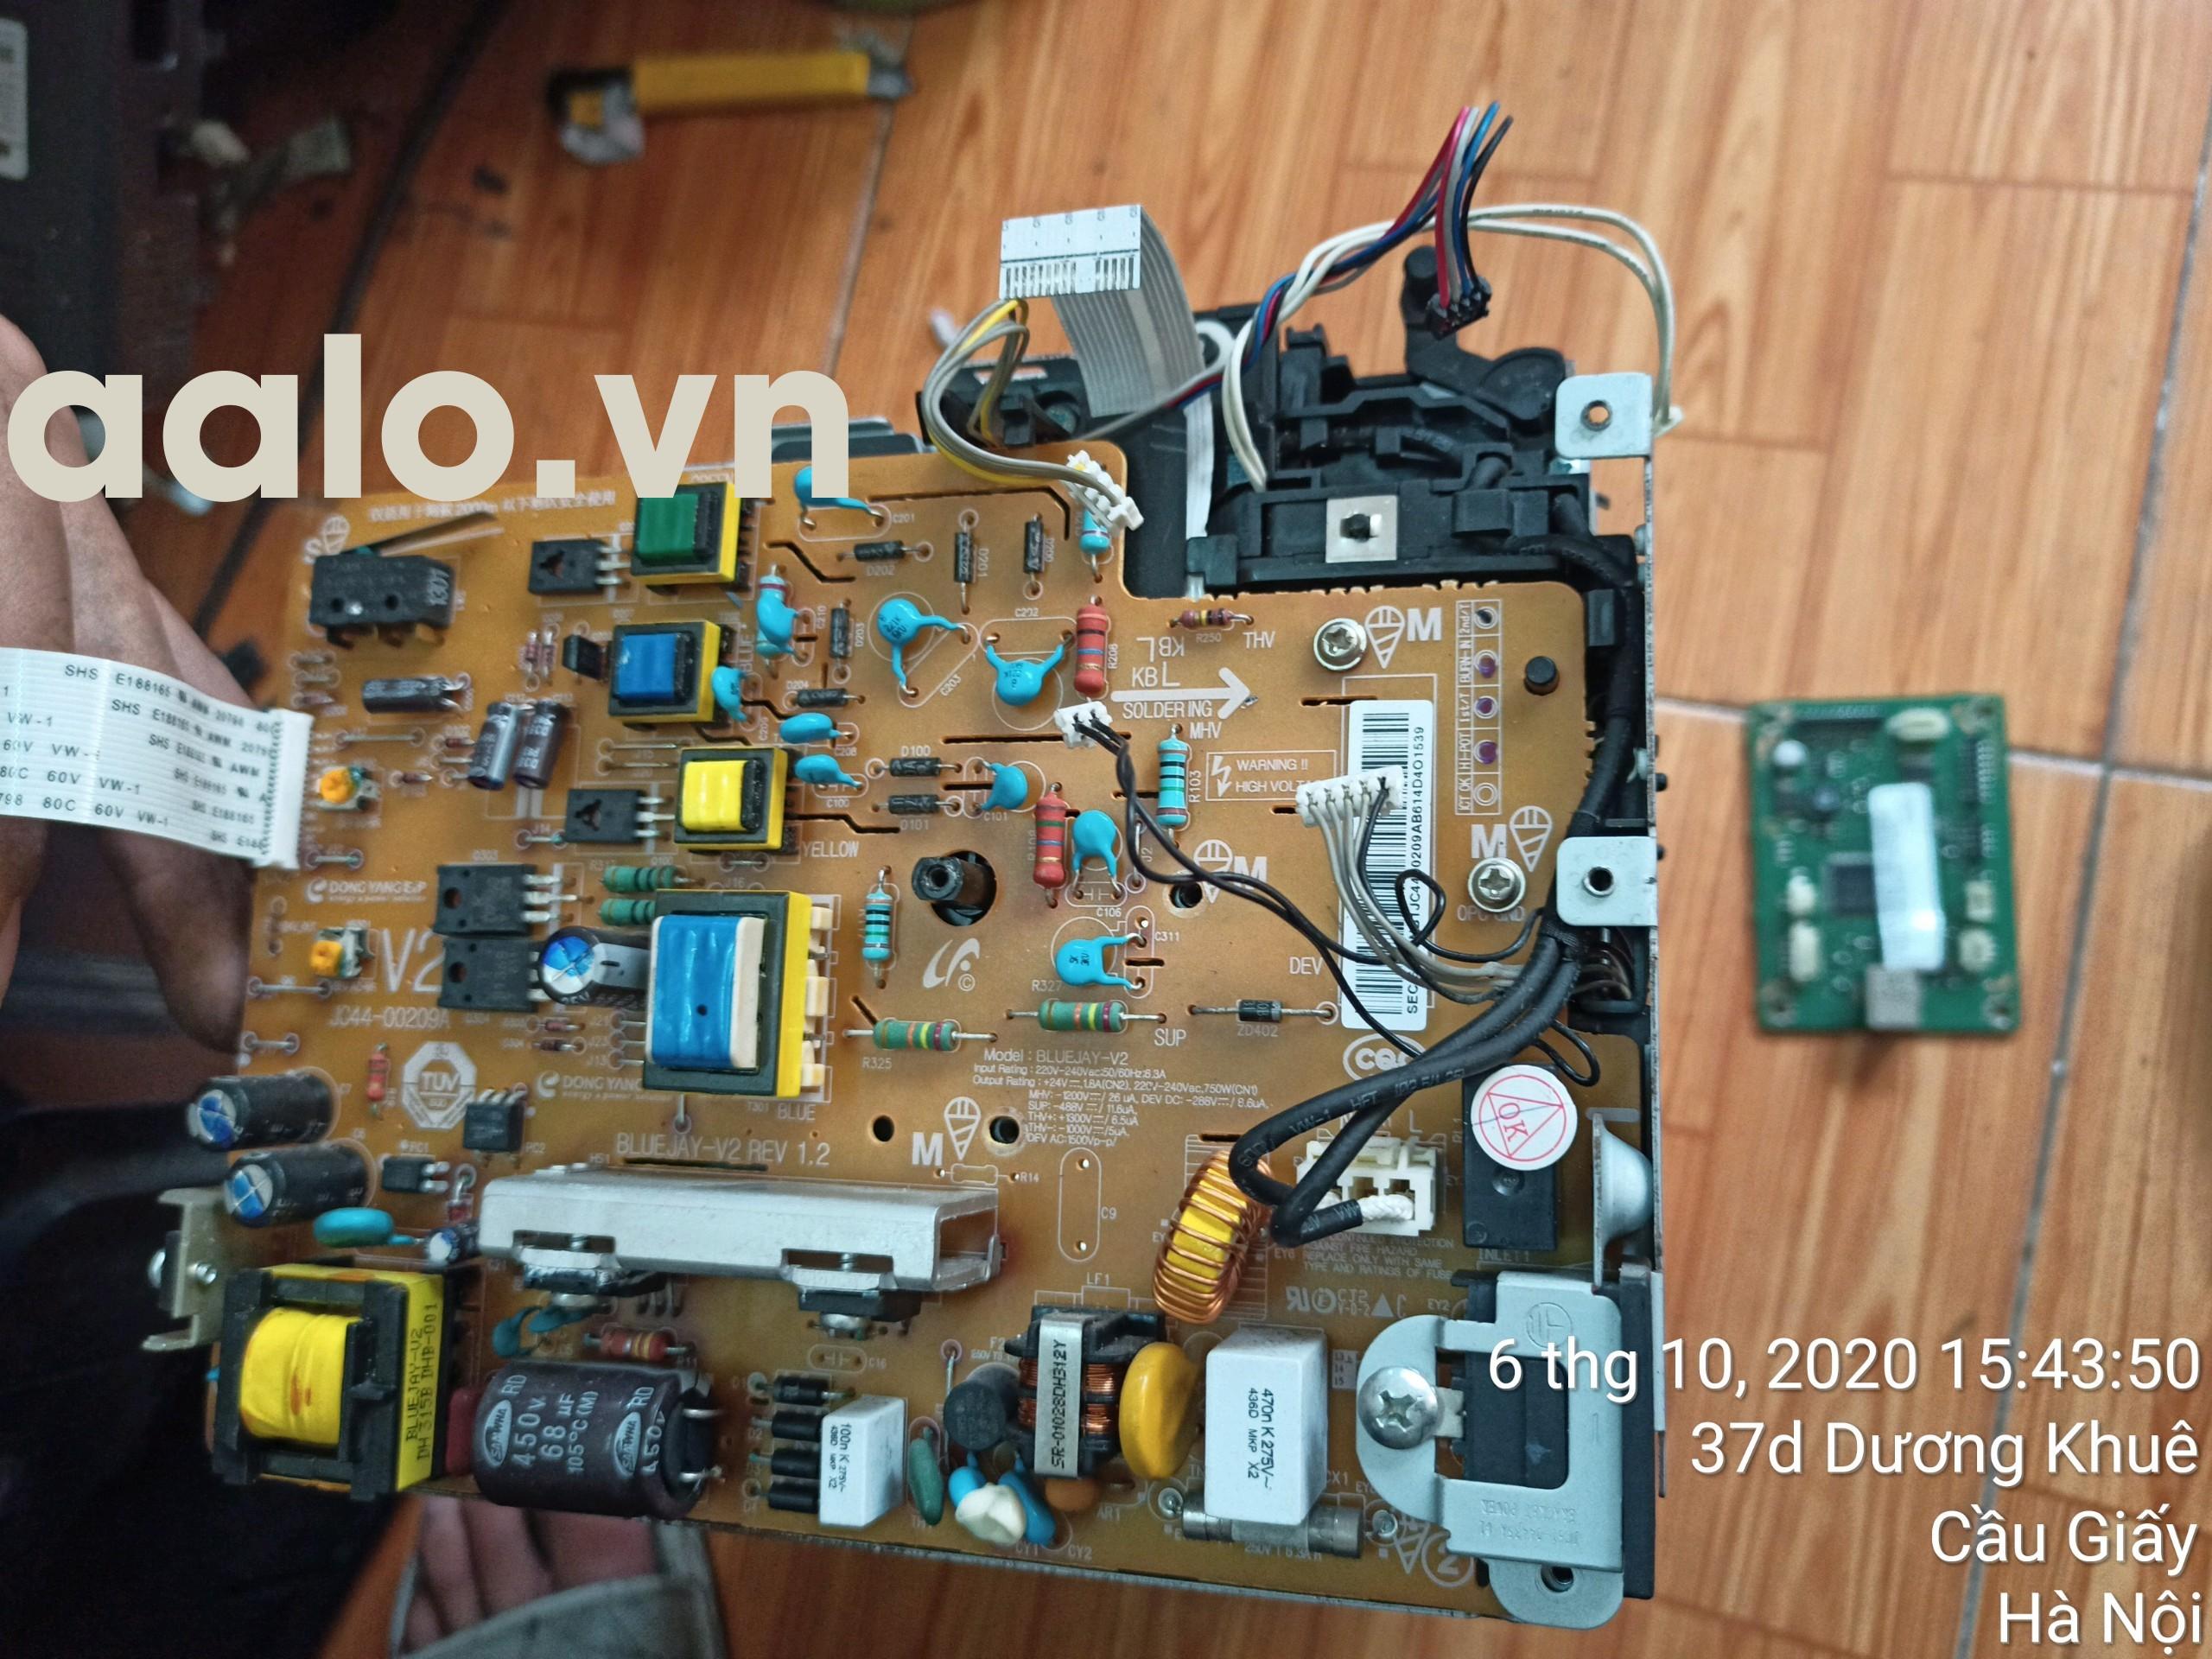 Sửa Máy in Laser Samsung ML-2161 lỗi không lên nguồn-aalo.vn